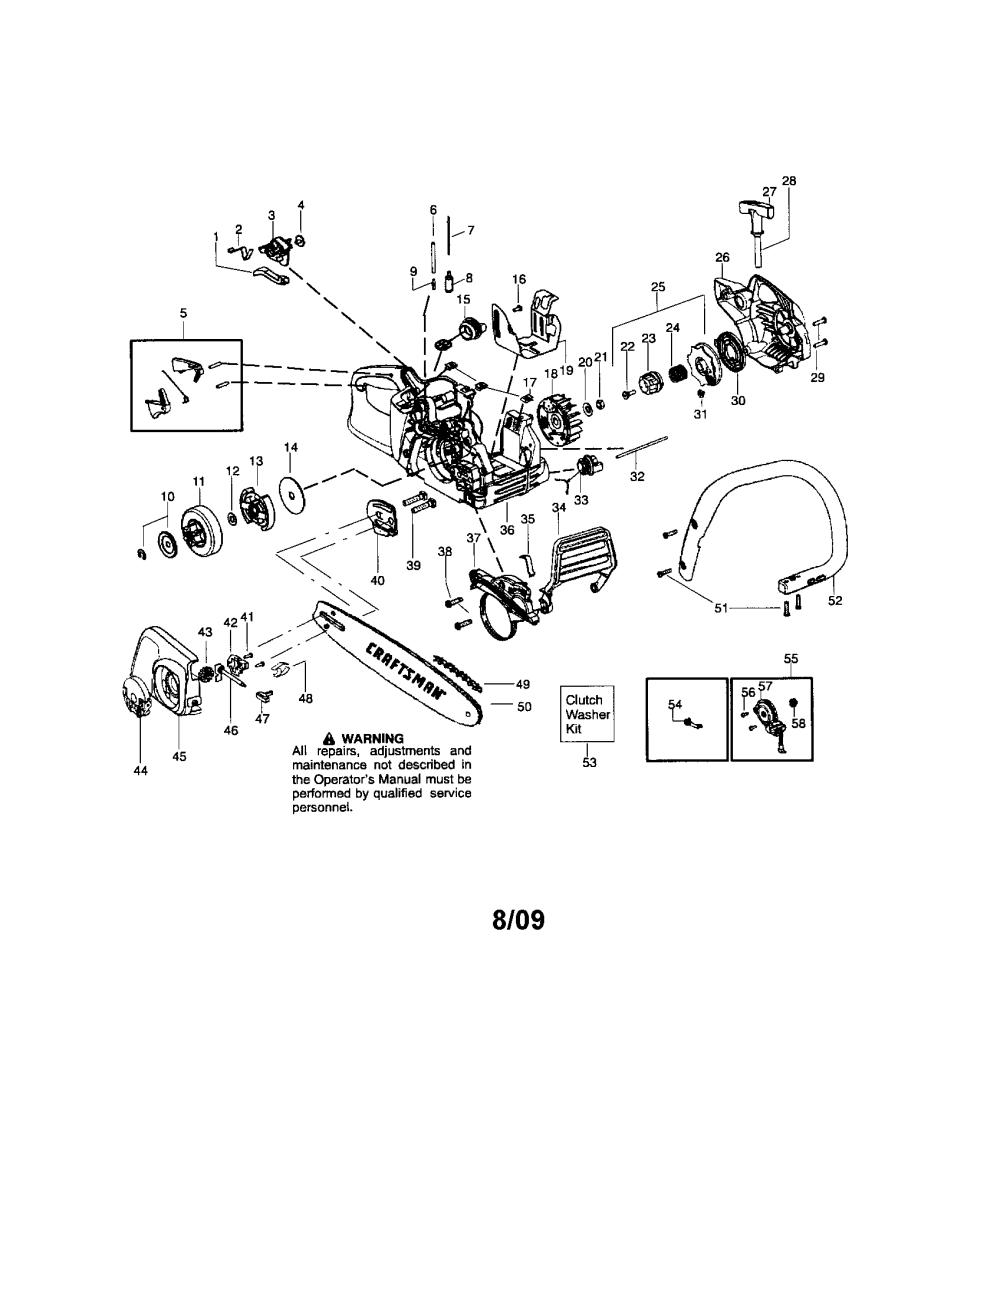 medium resolution of craftsman chainsaw wiring diagram free picture